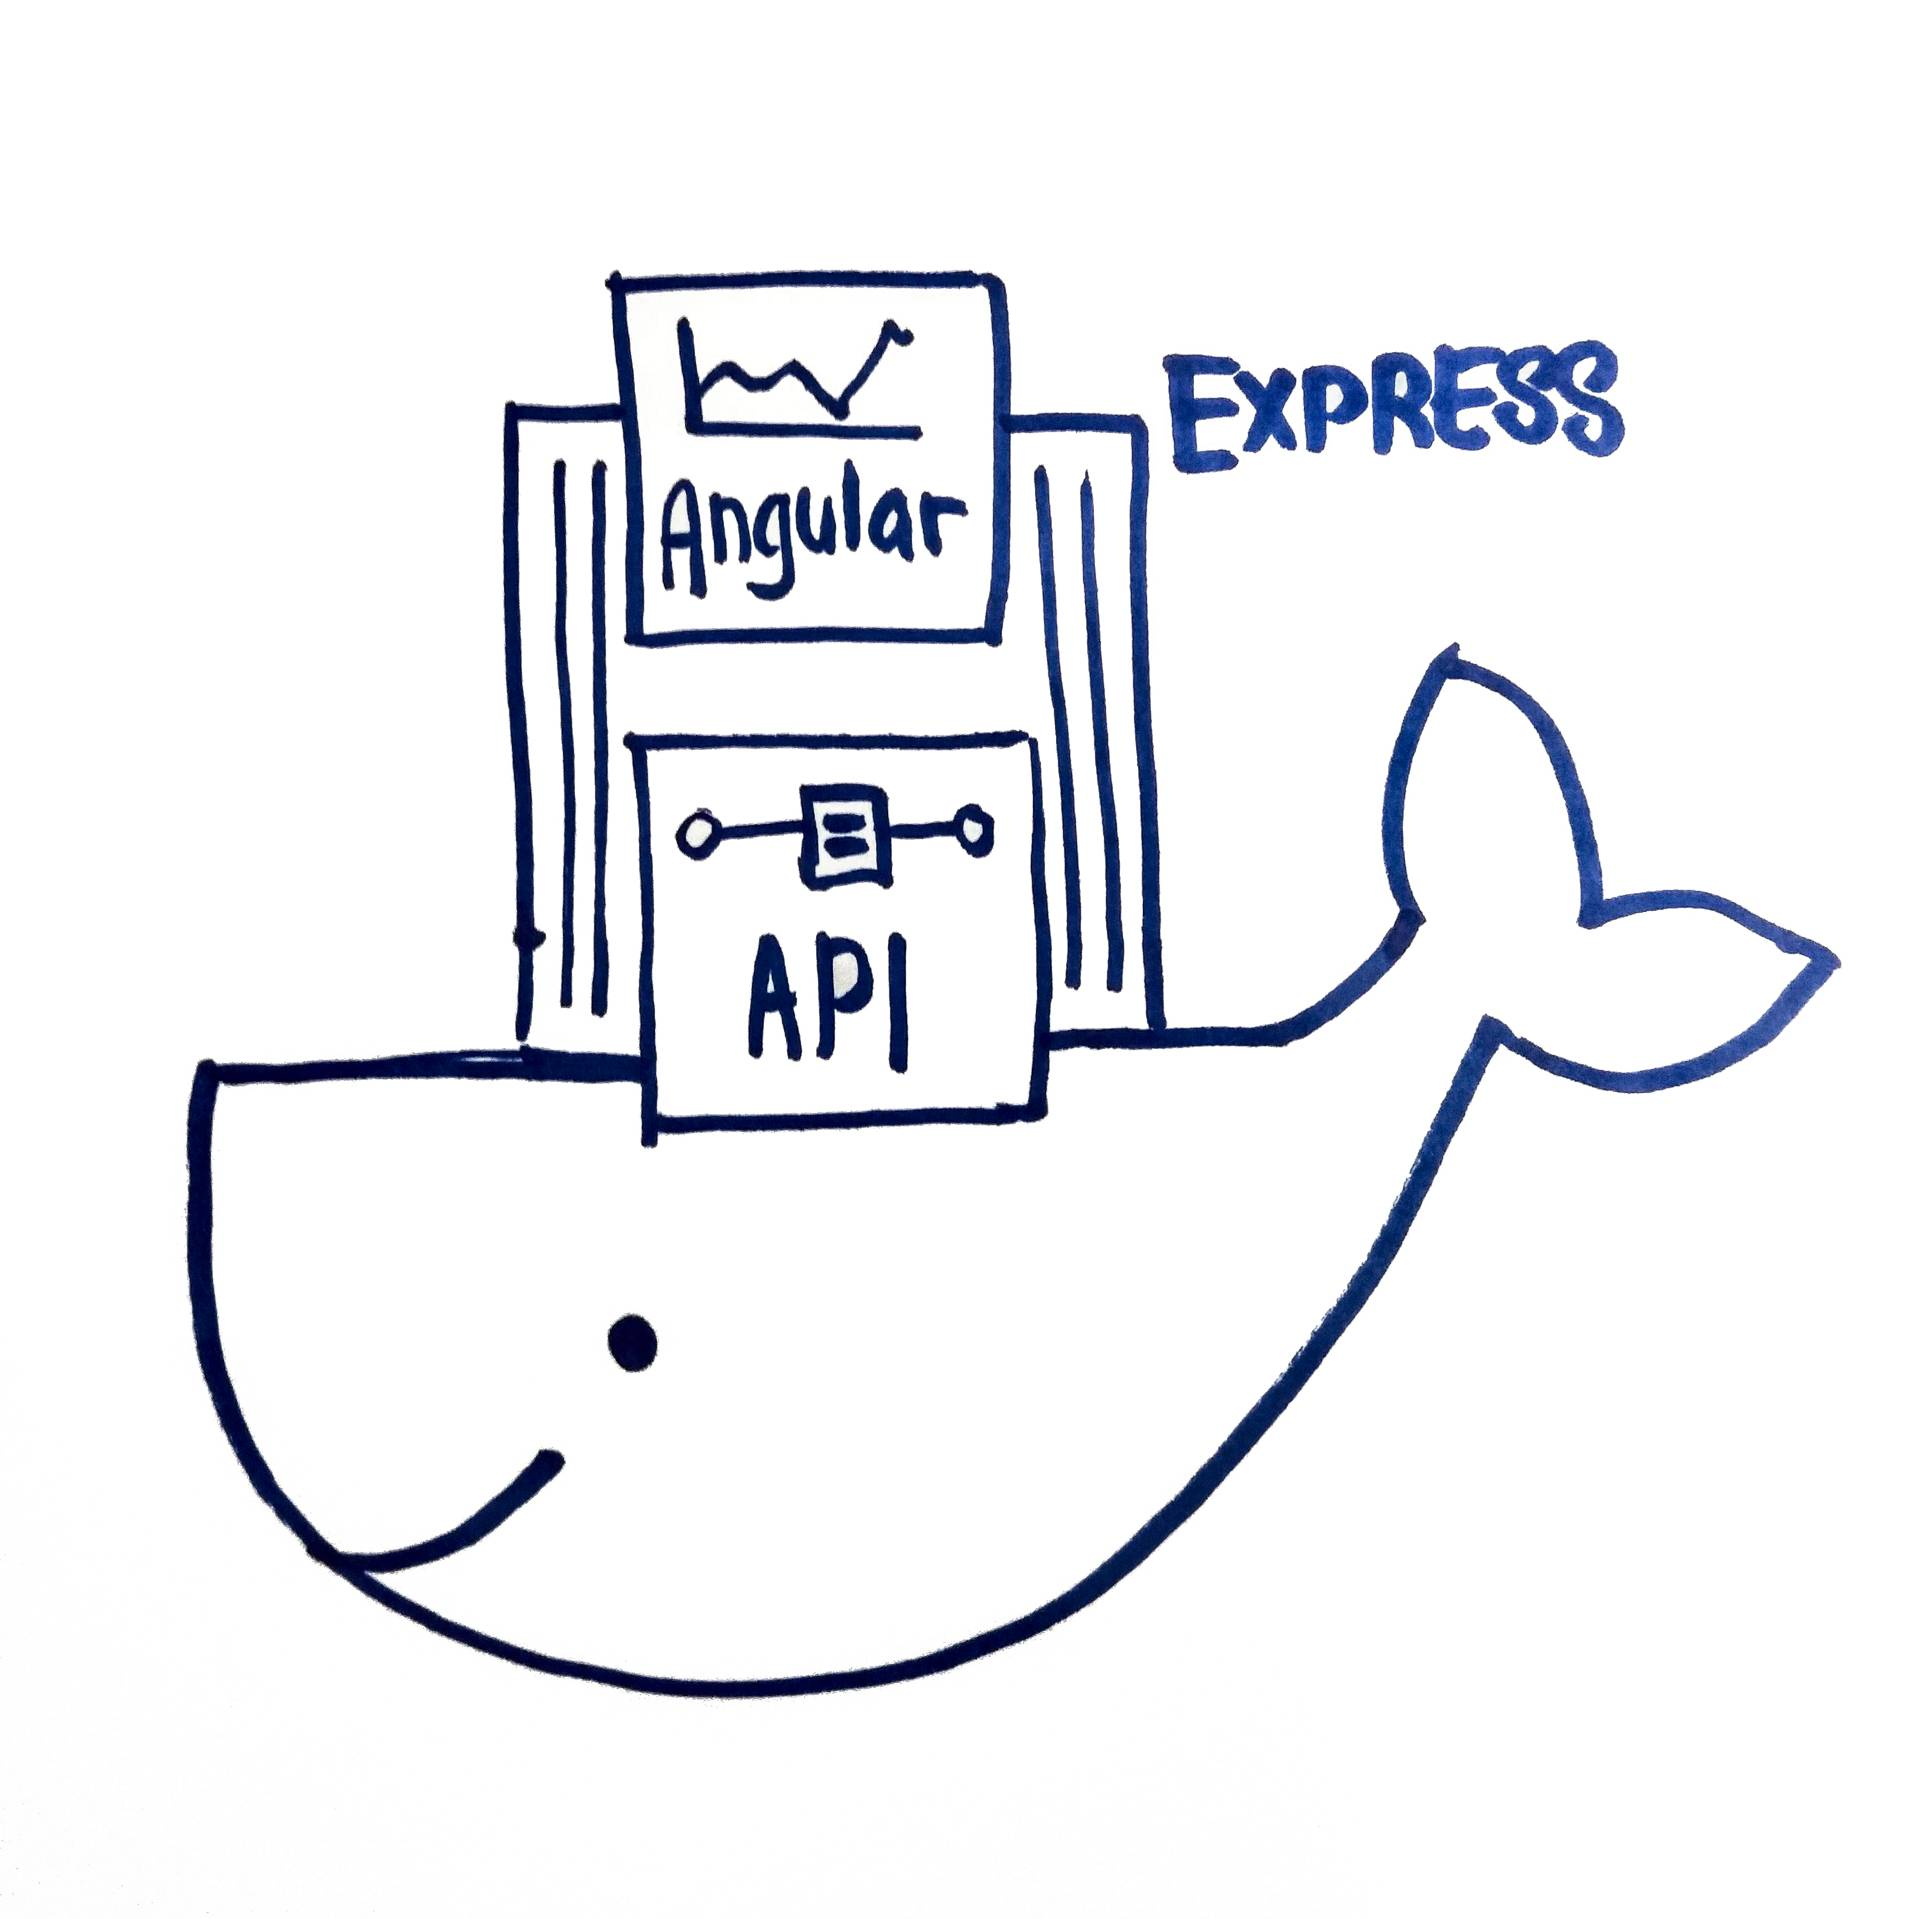 Docker Alpine + ExpressJS + Angular | Codementor